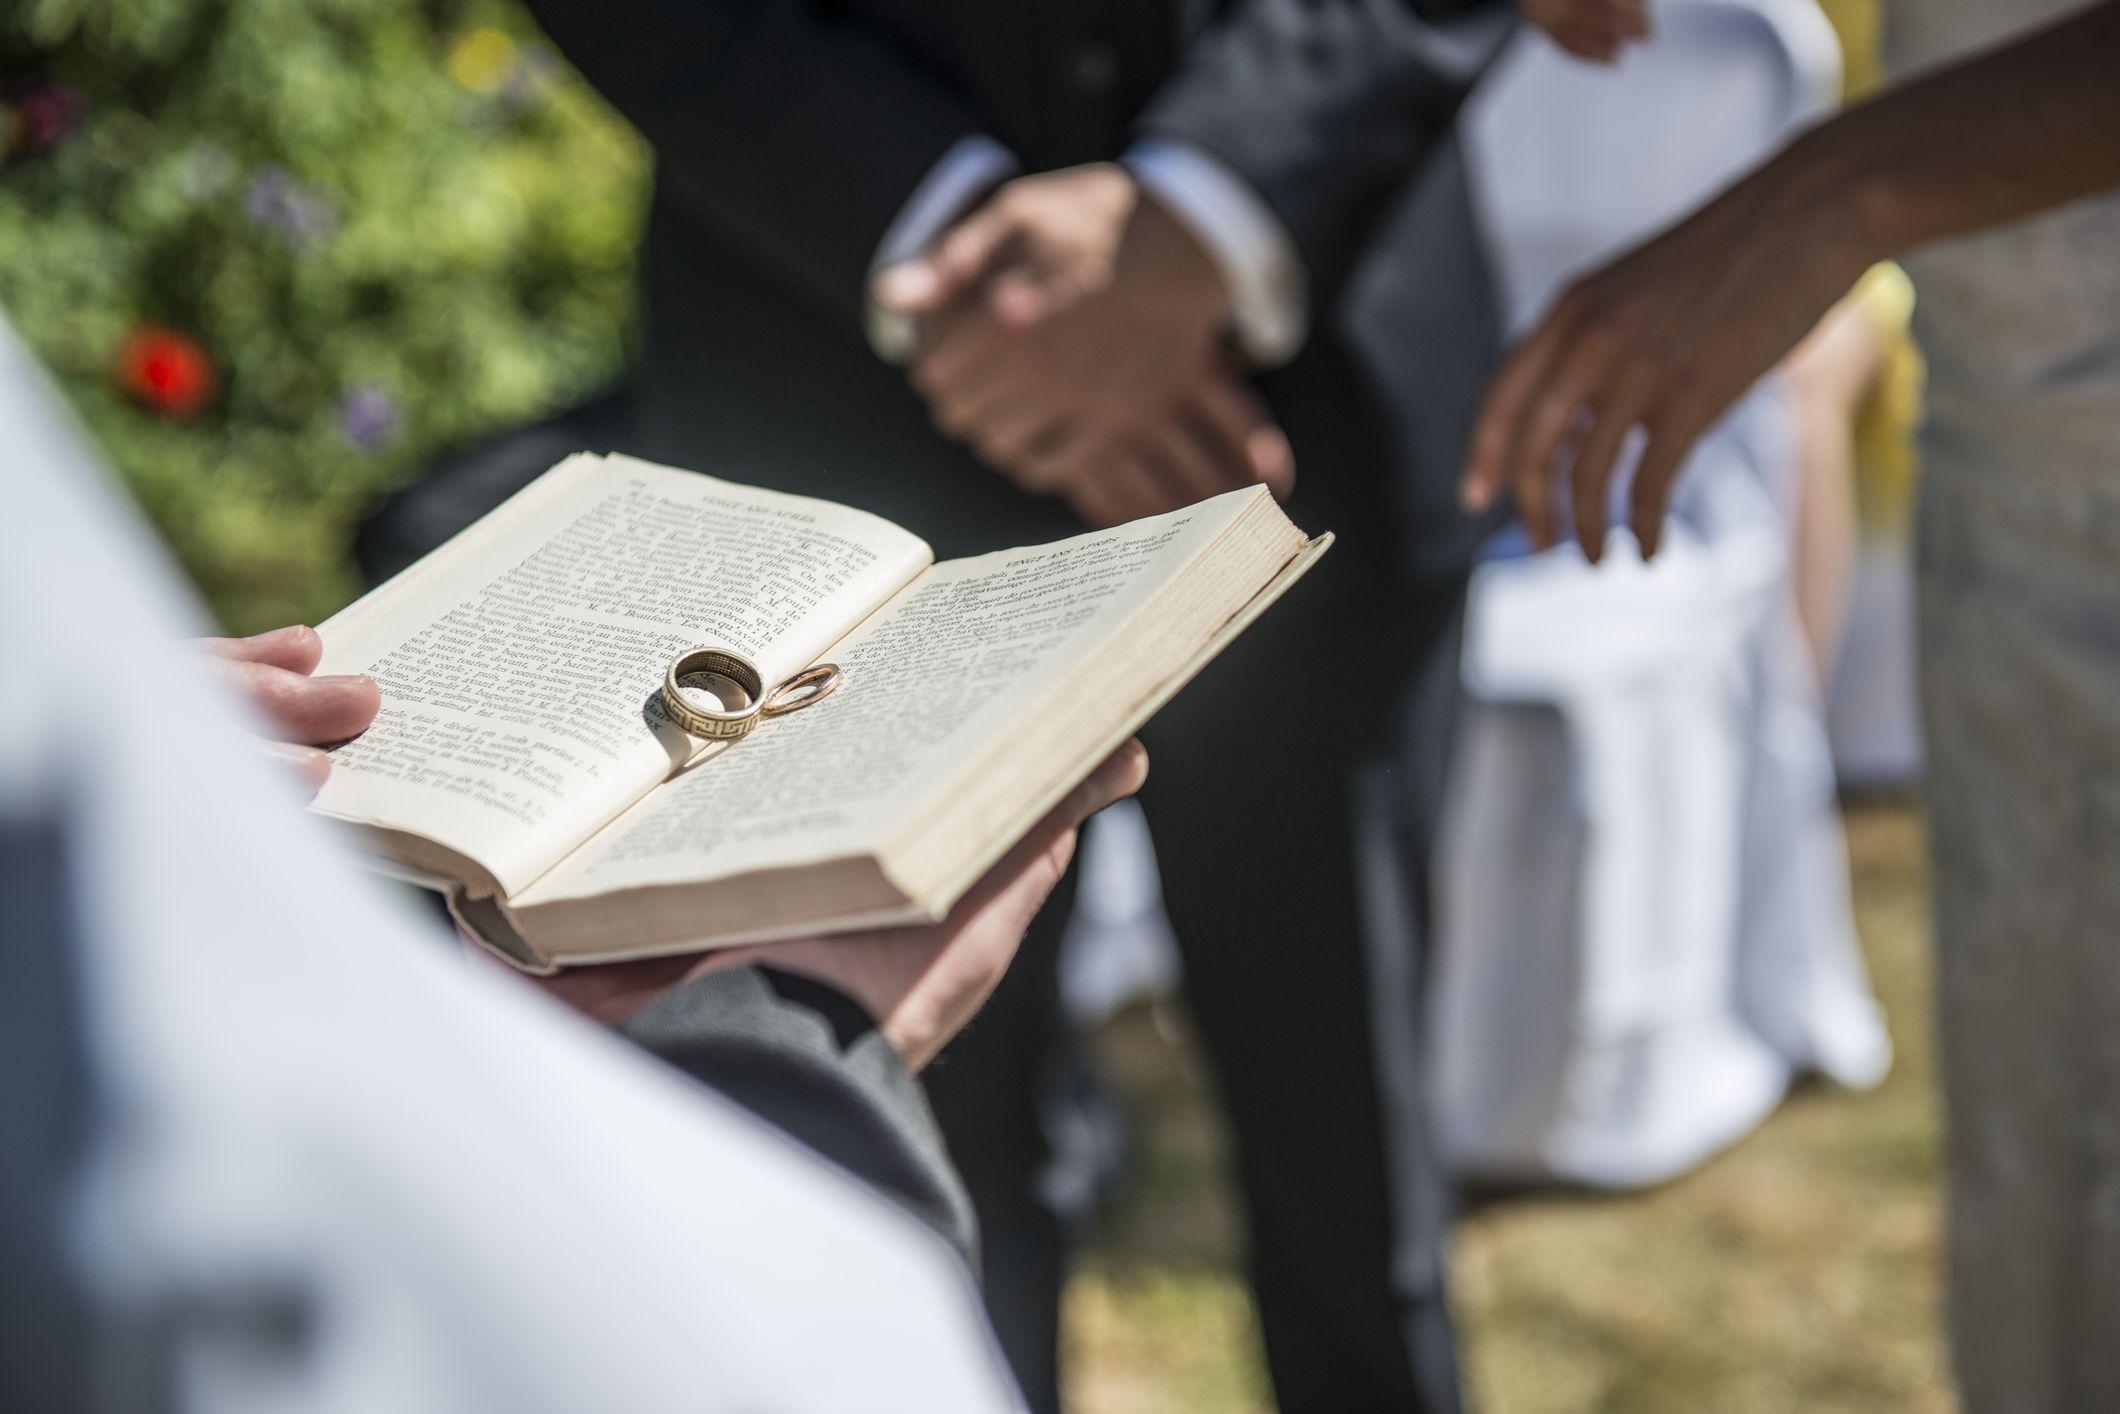 Bendiciones Para Matrimonio Biblia : Lecturas para ceremonia de matrimonio católica